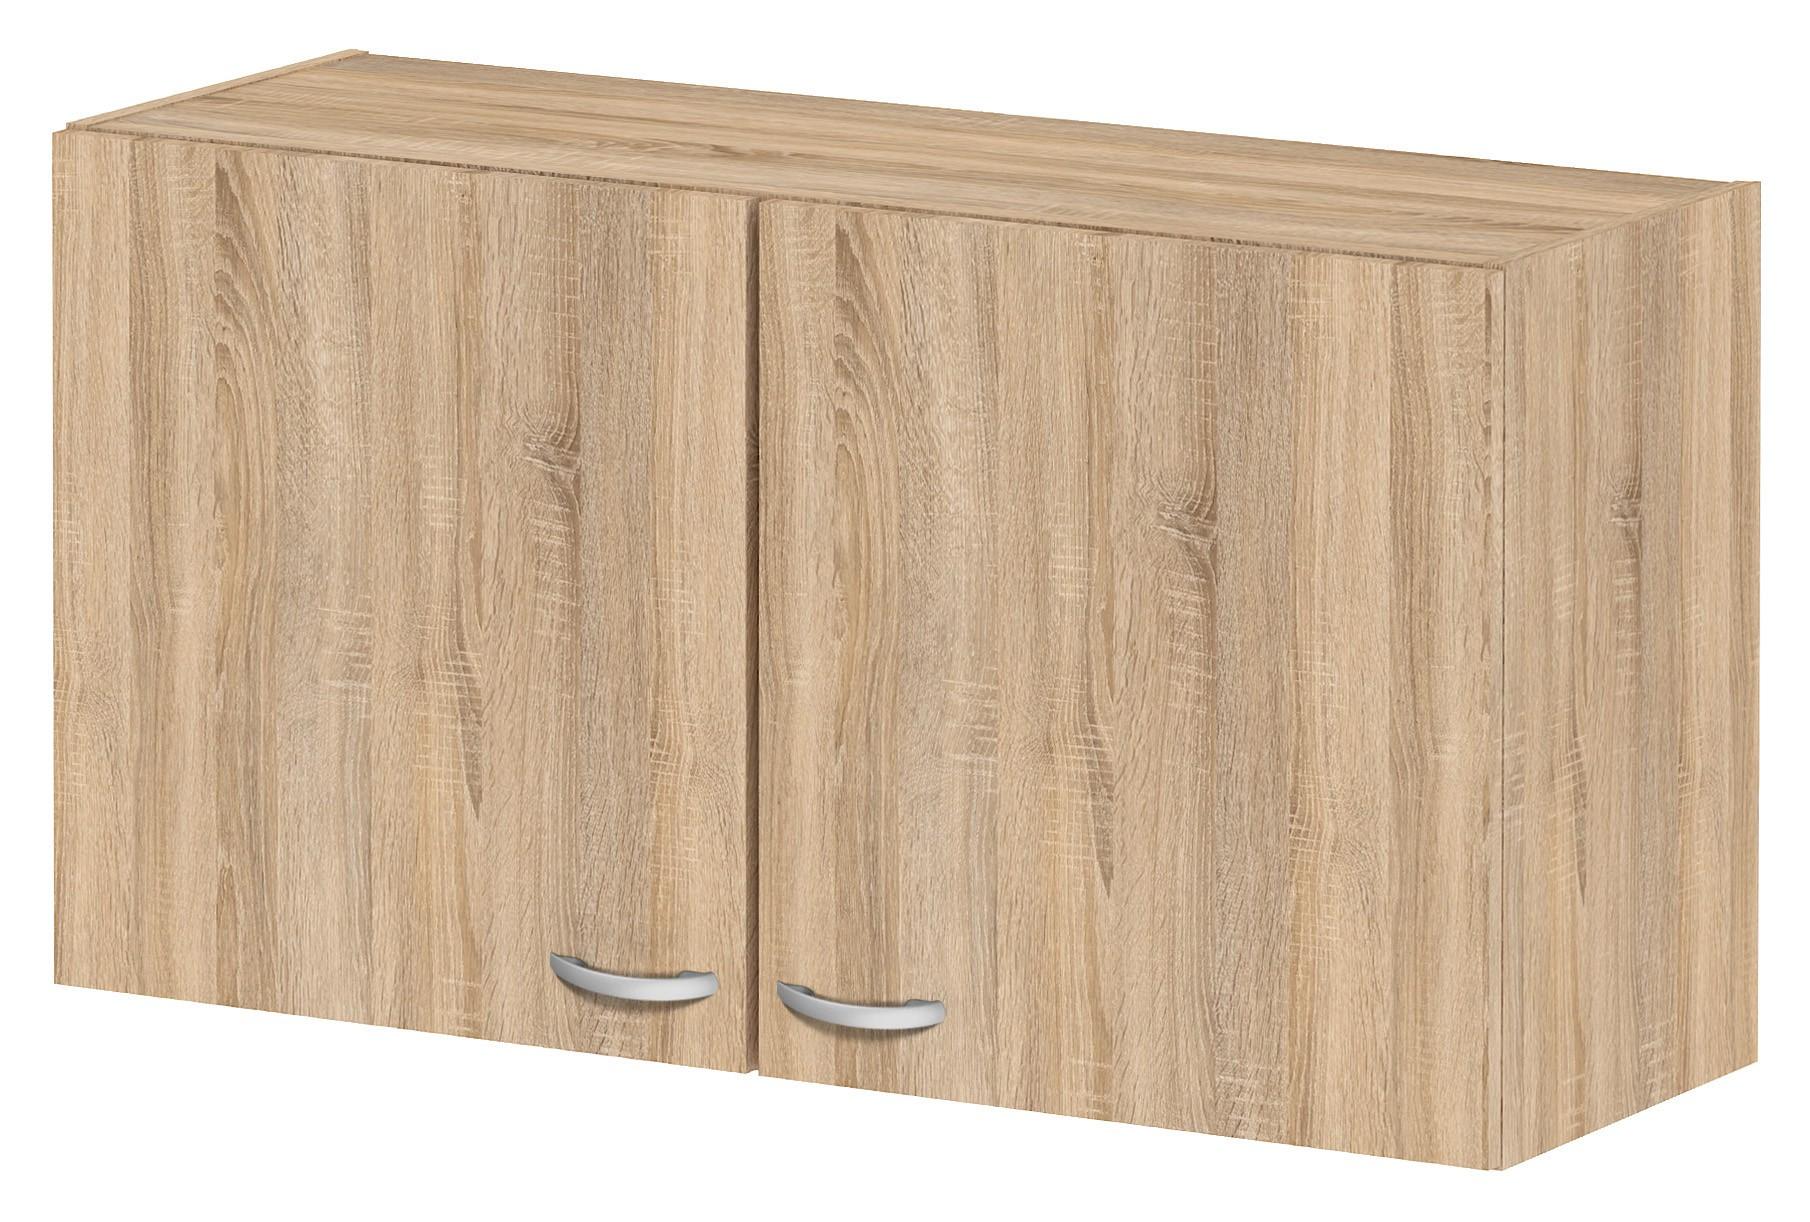 Pensile mobile cucina 2 ante legno finitura quercia cm 98x34x54h Tvilum